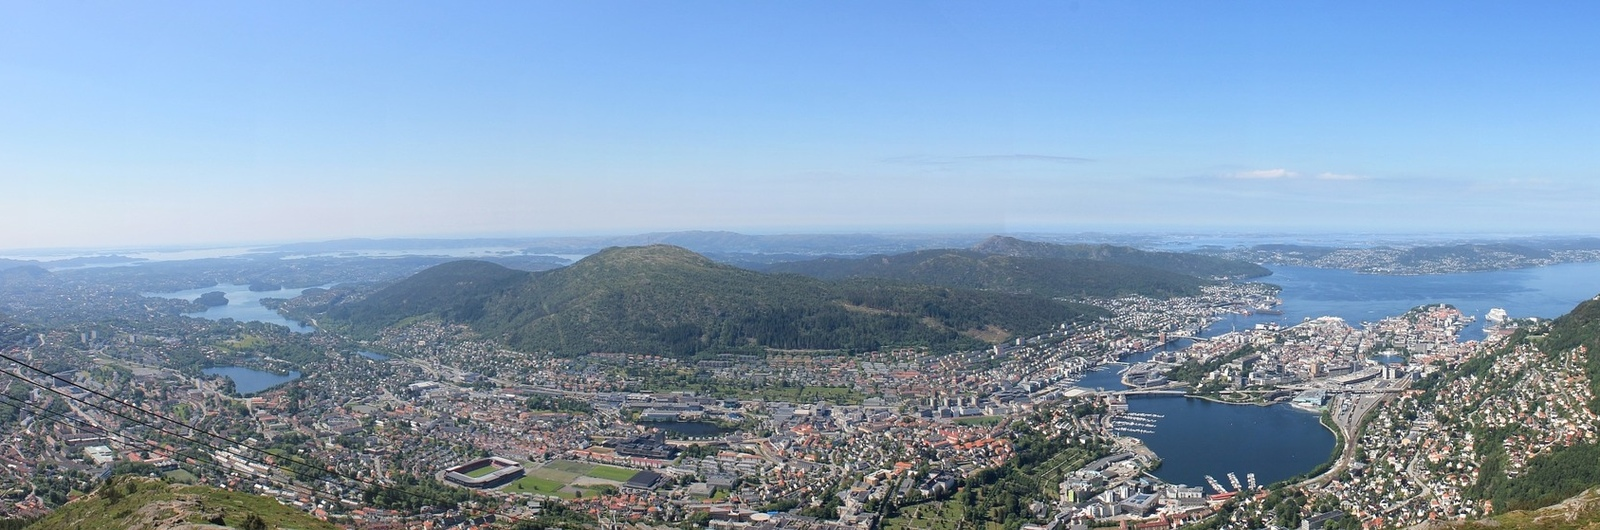 bergen city header